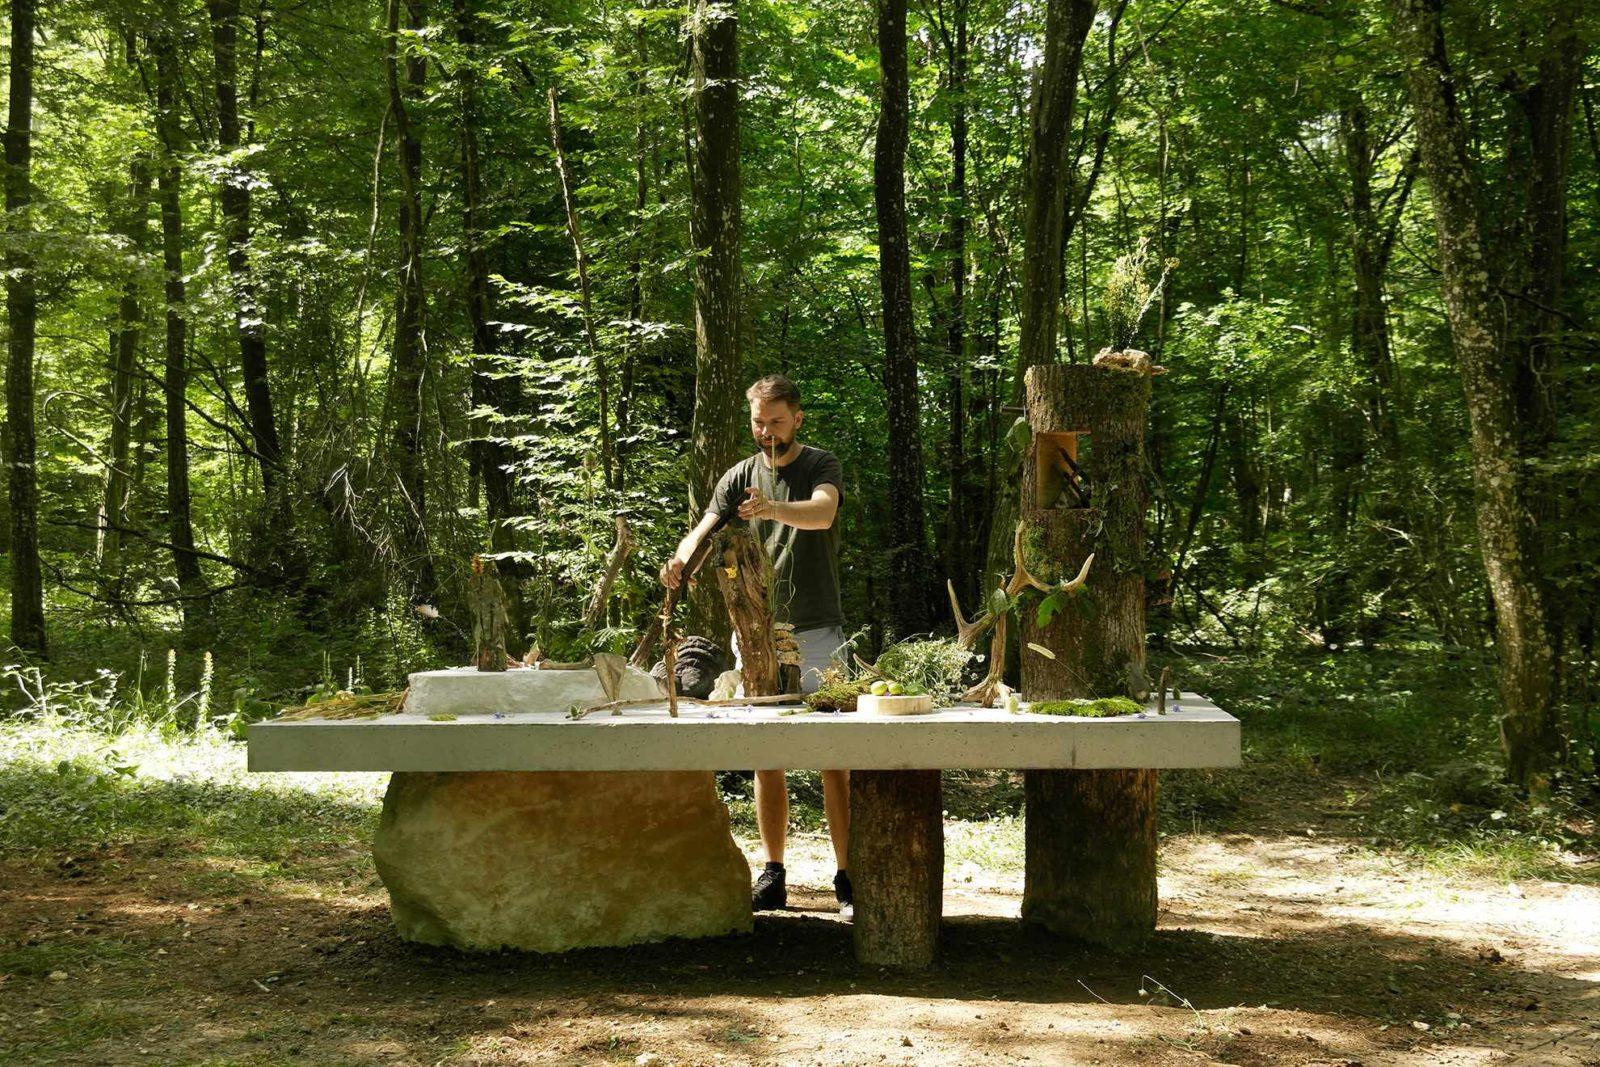 David de Tscharner, Nature morte, Vent des forêts 2018